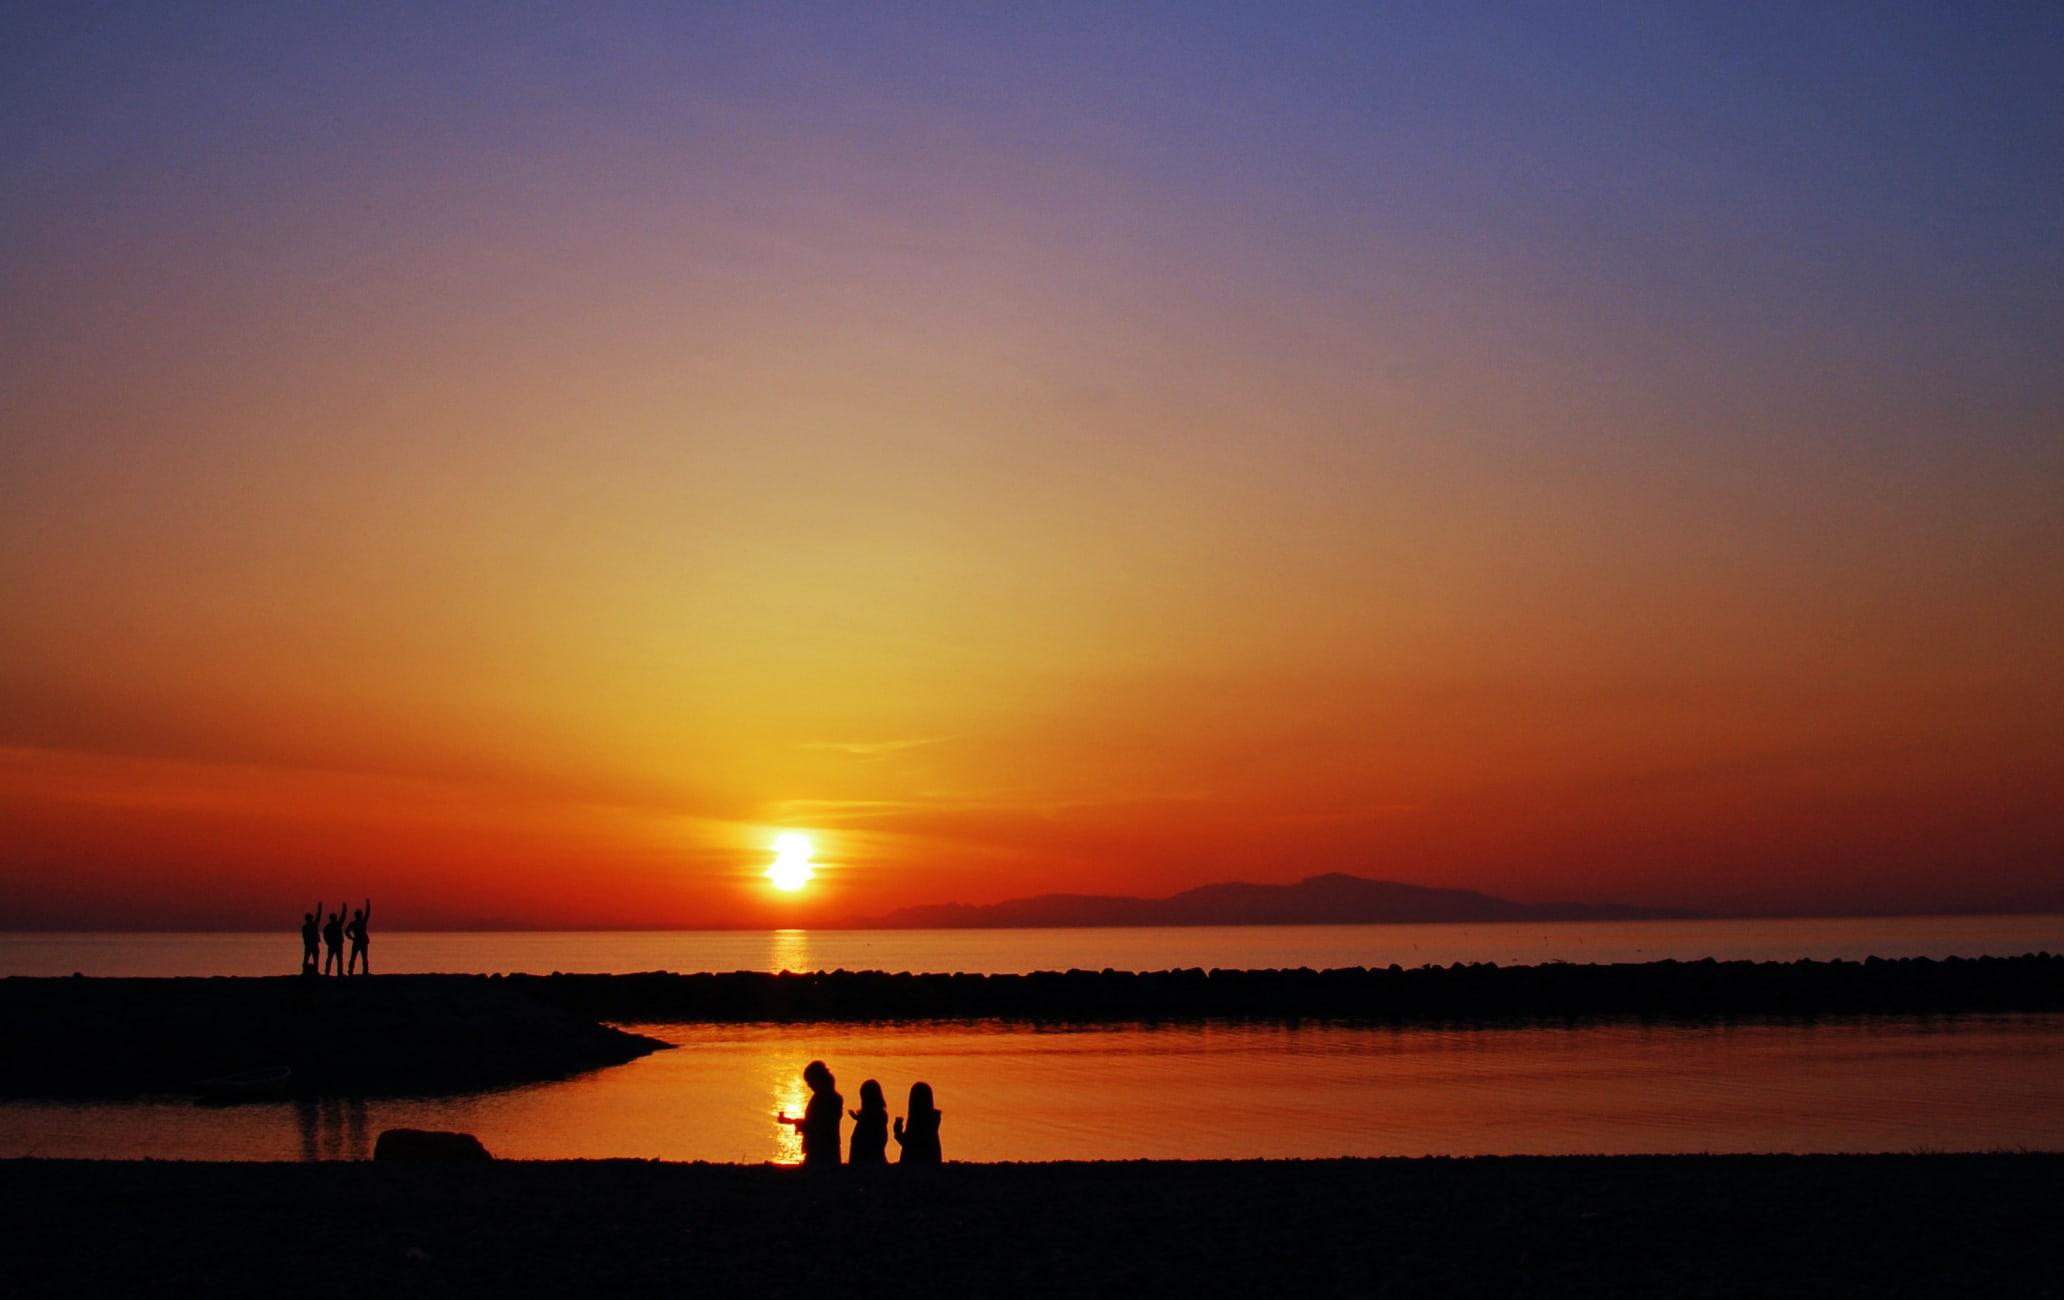 Goshiki-hama Beach